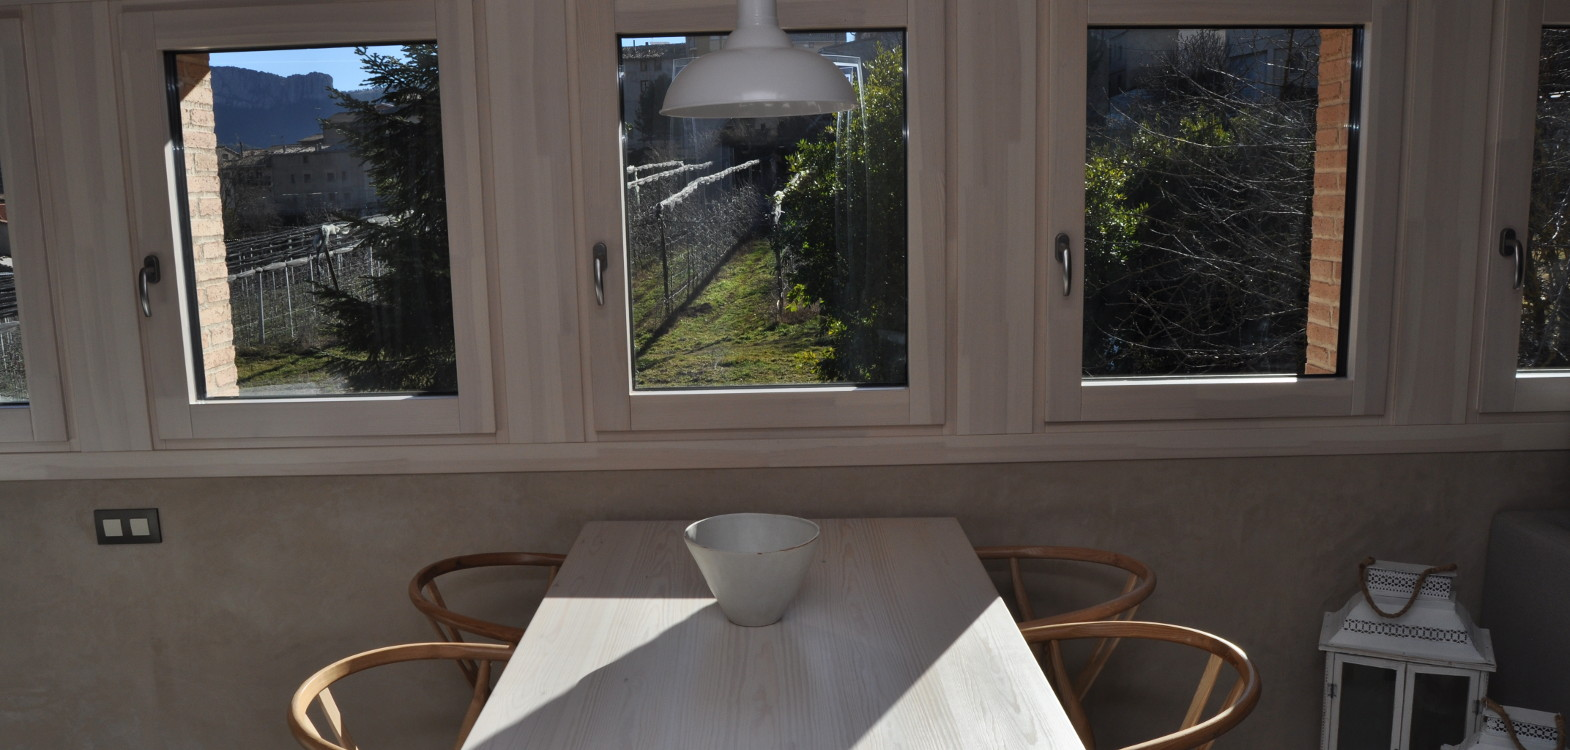 ventanas con triple cristal madera aluminio de pino carrete finestres l'era den bella solsones